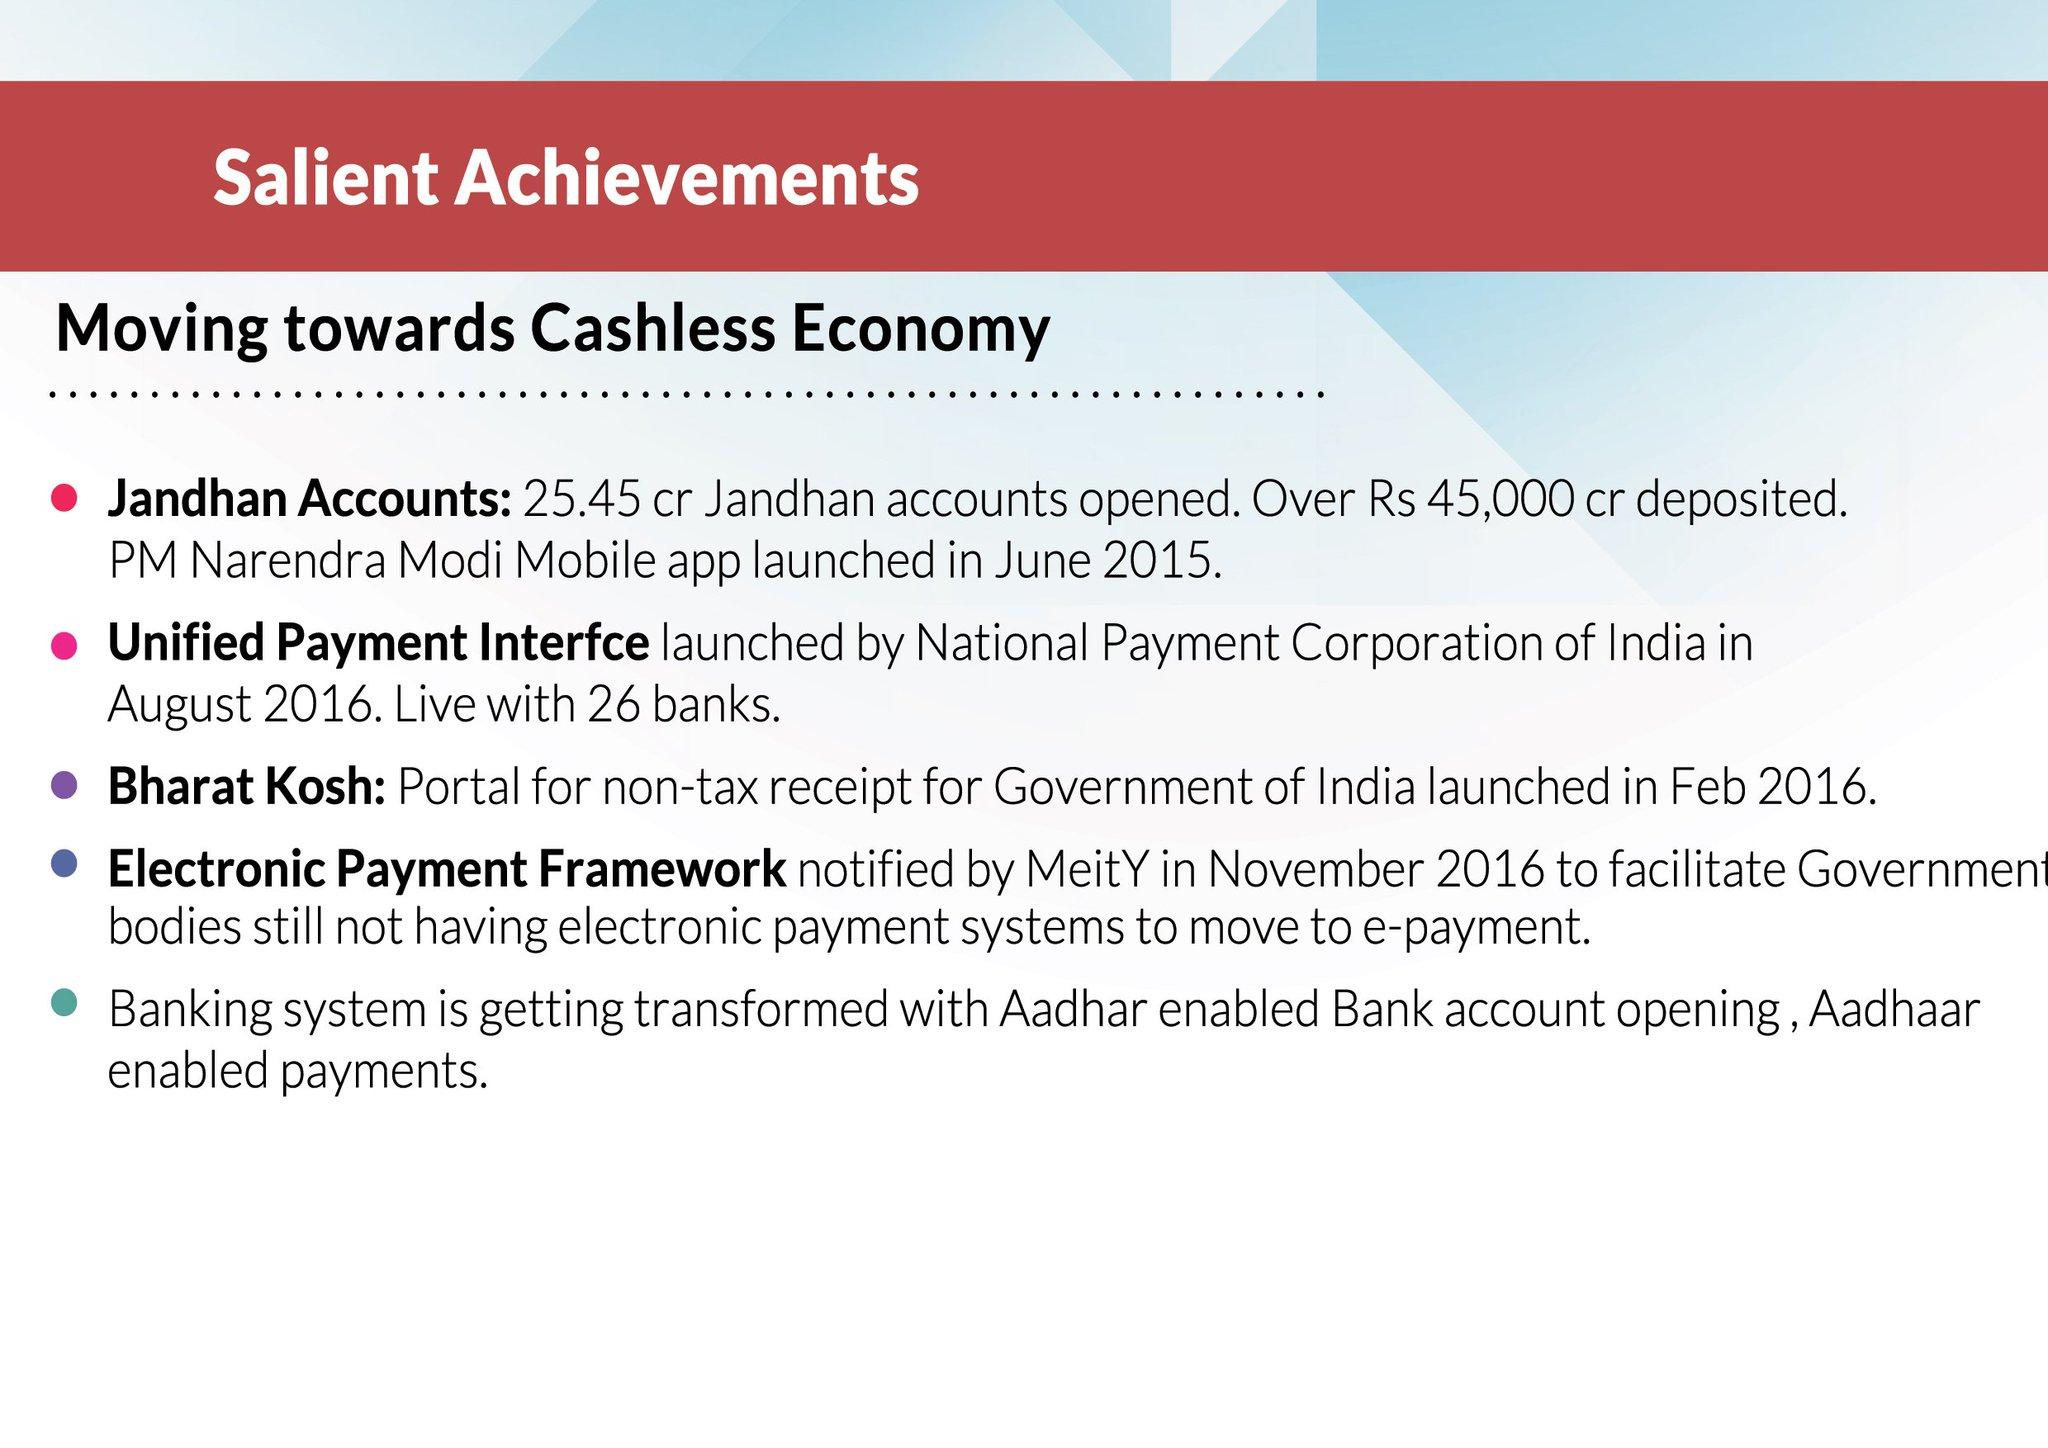 Moving towards Cashless Economy. #TransformingIndia through #DigitalIndia. #EEC2016 https://t.co/u8IyyCdIJ4